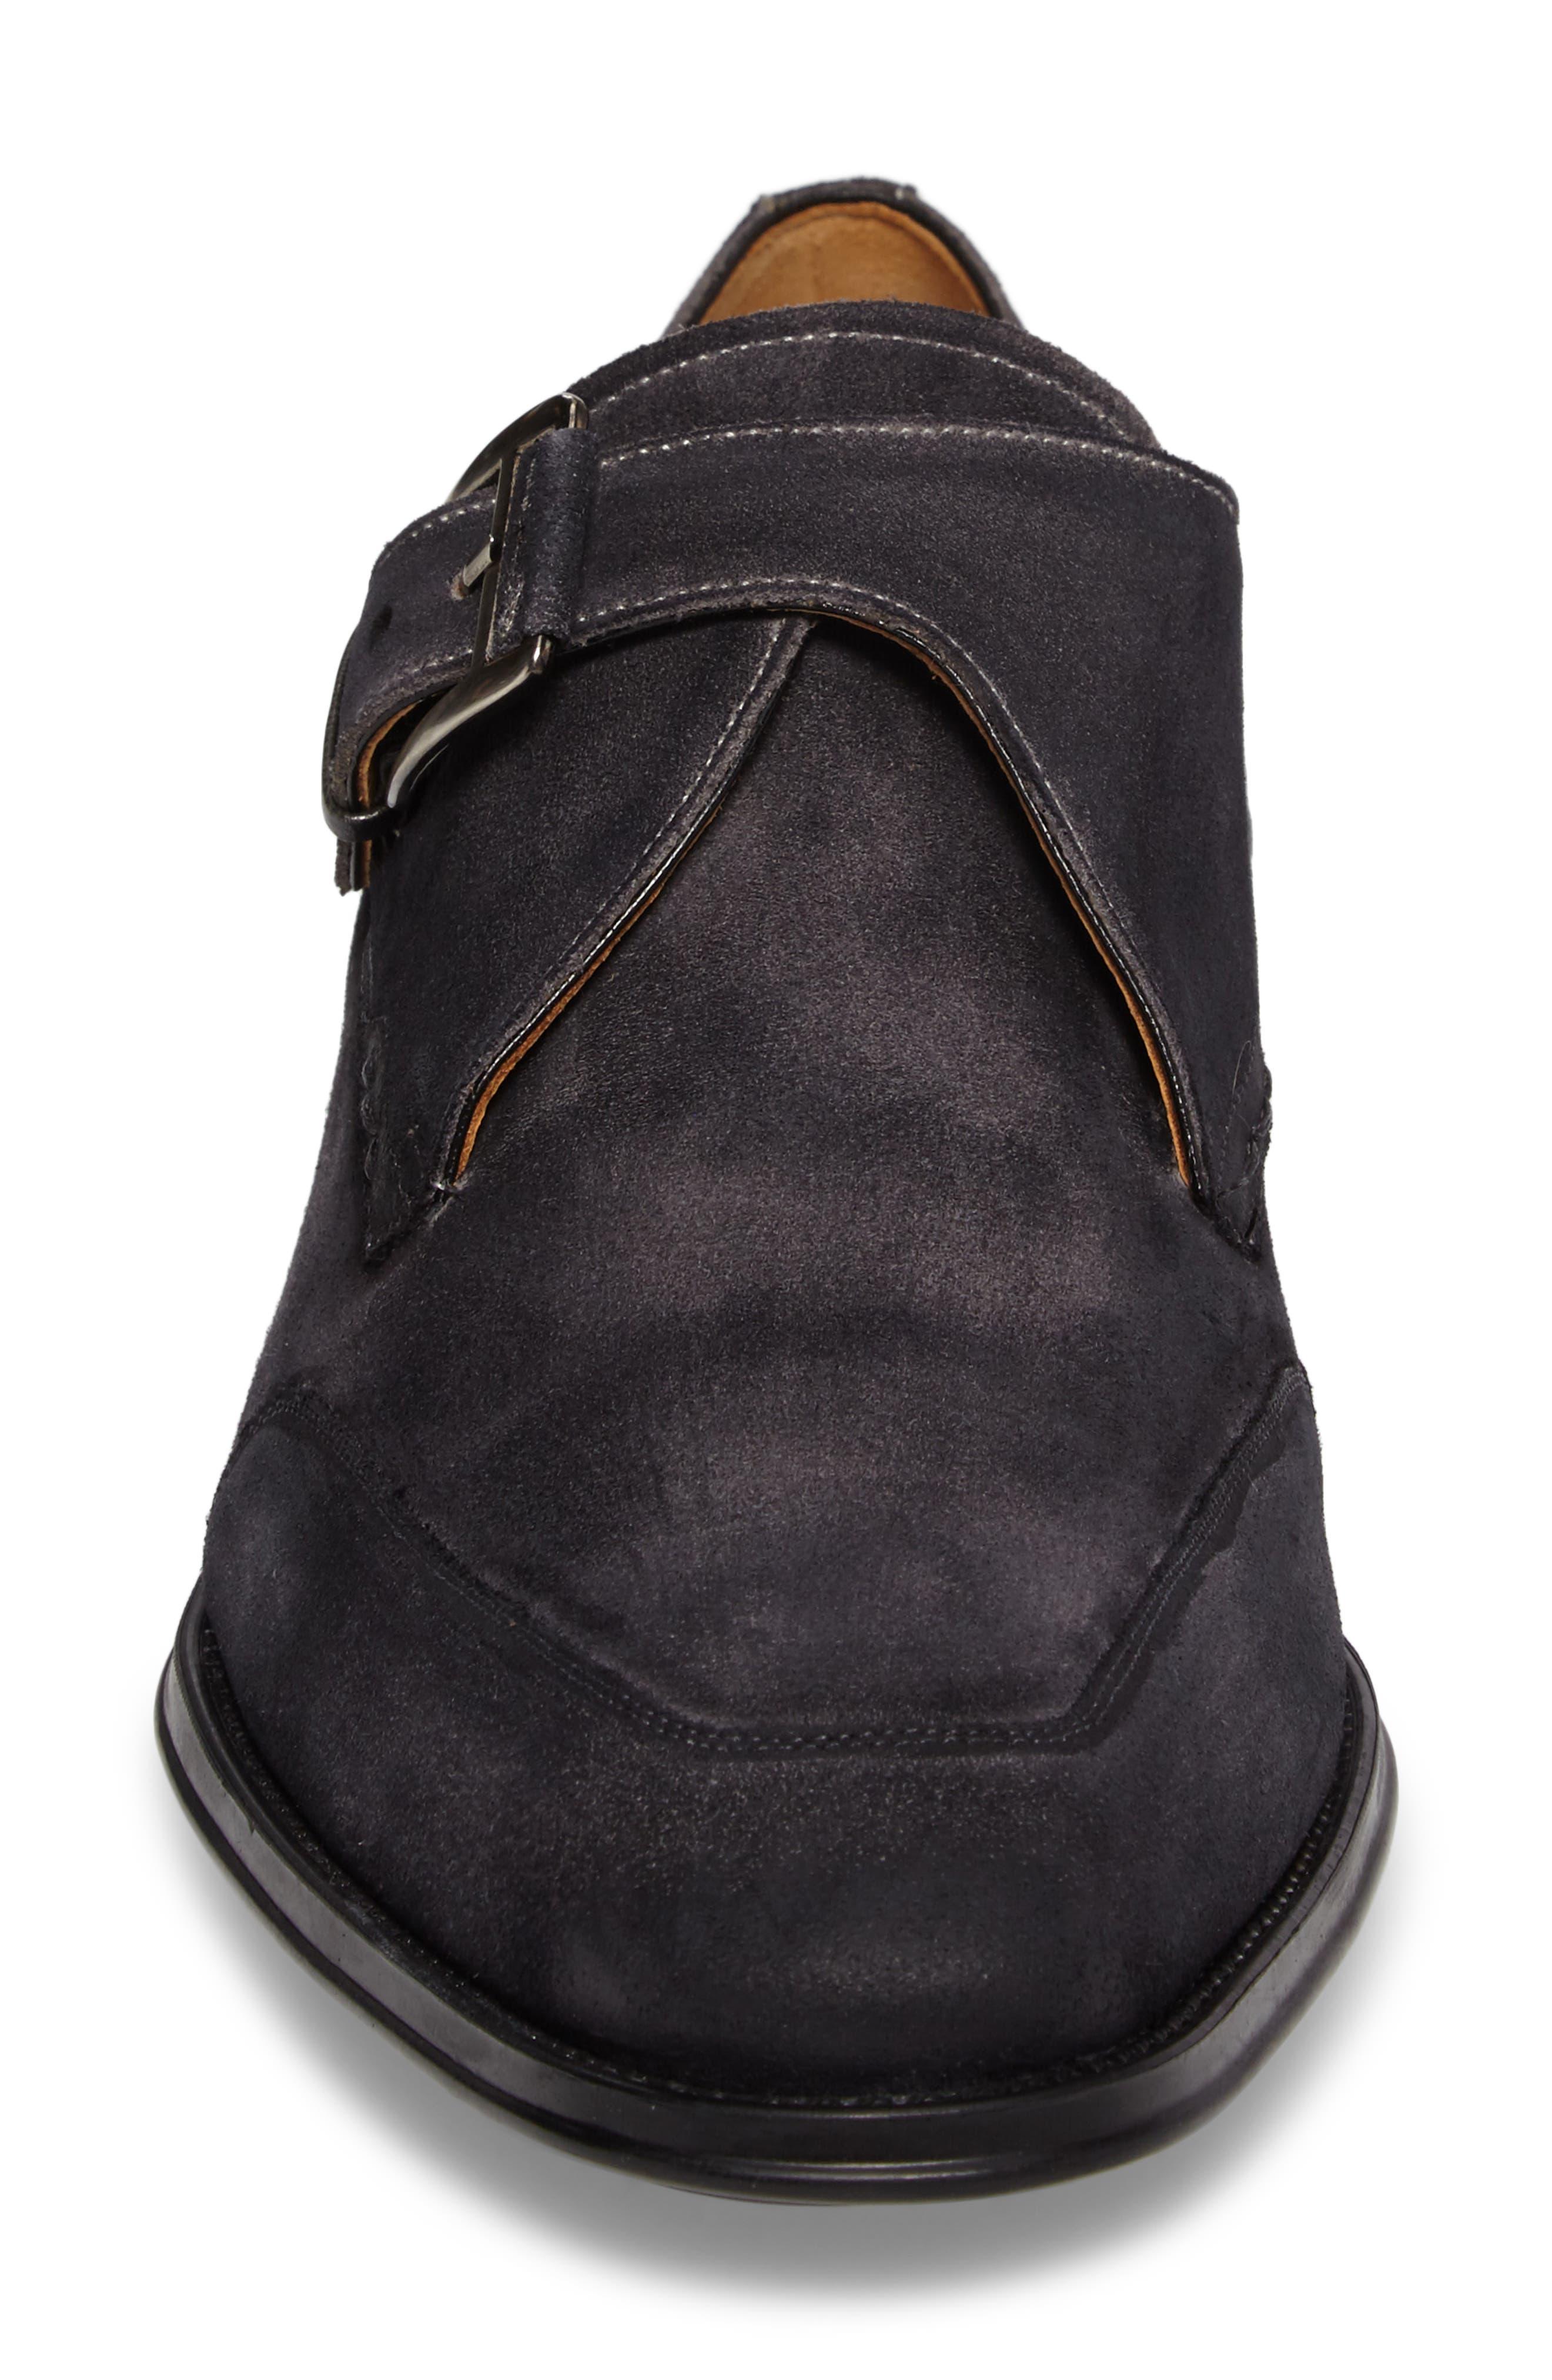 Baza Monk Strap Shoe,                             Alternate thumbnail 4, color,                             020